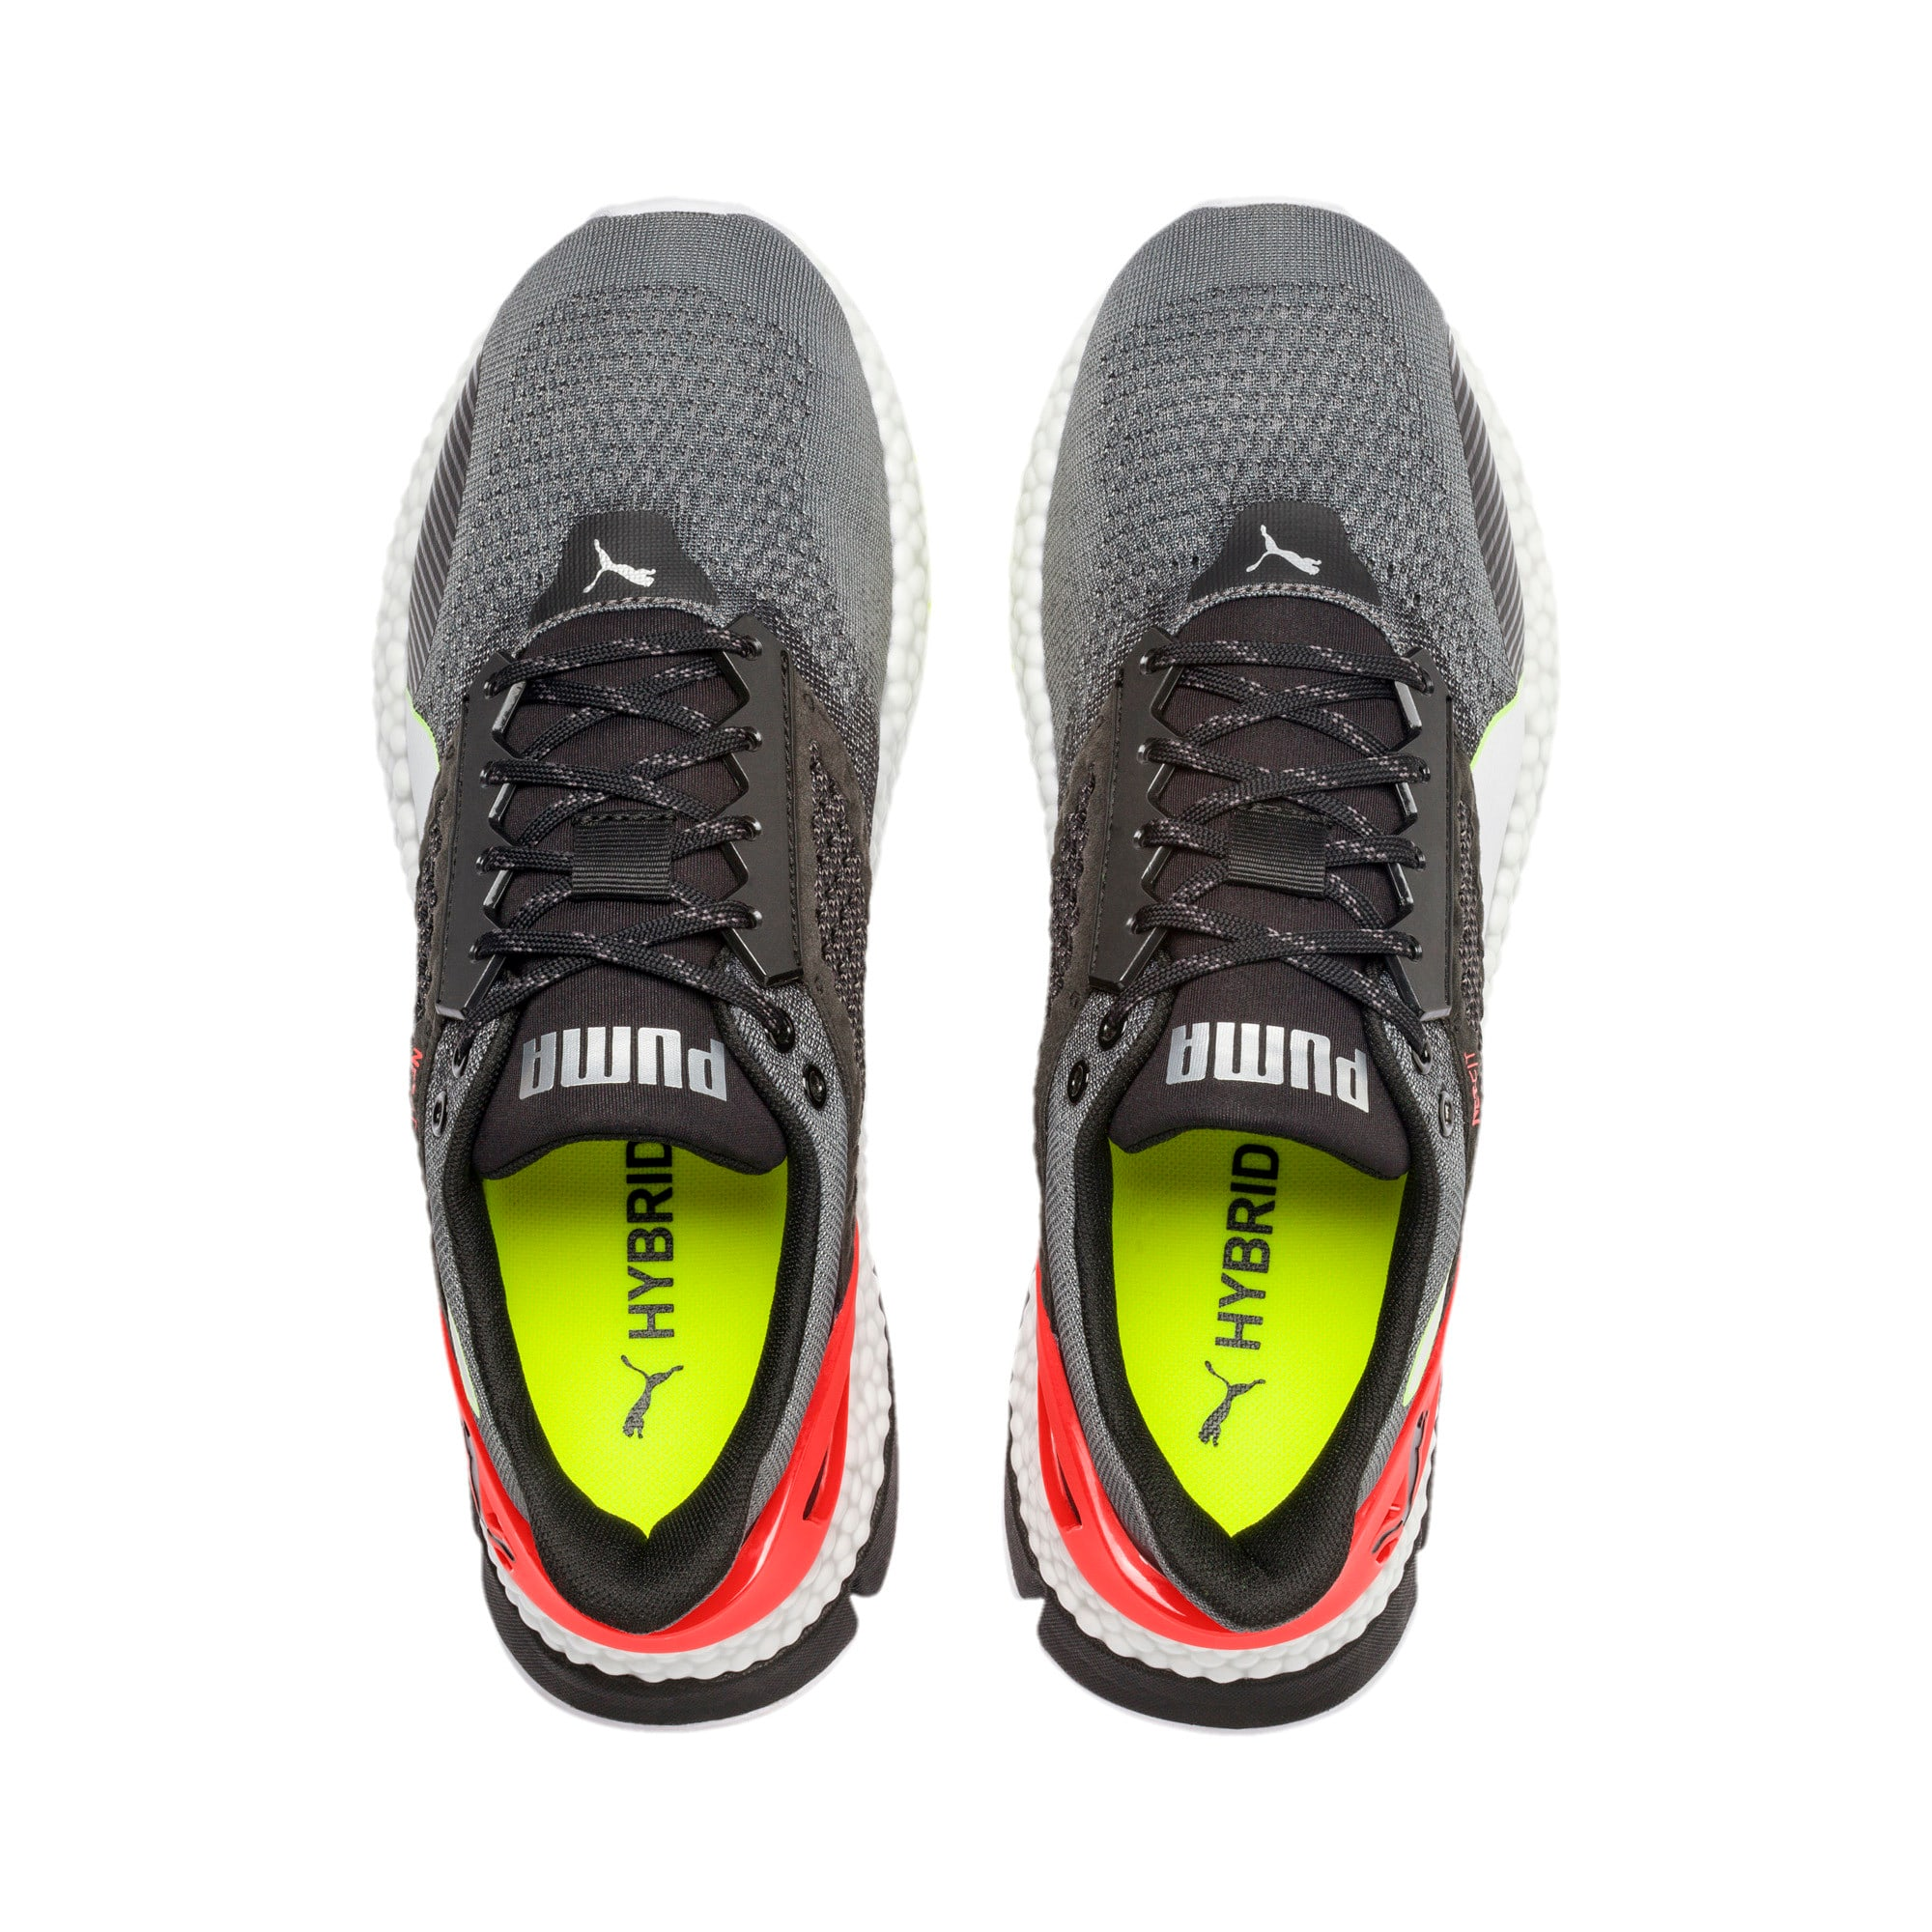 Thumbnail 8 of HYBRID Astro Men's Running Shoes, CASTLEROCK-Puma Blck-Ngy Red, medium